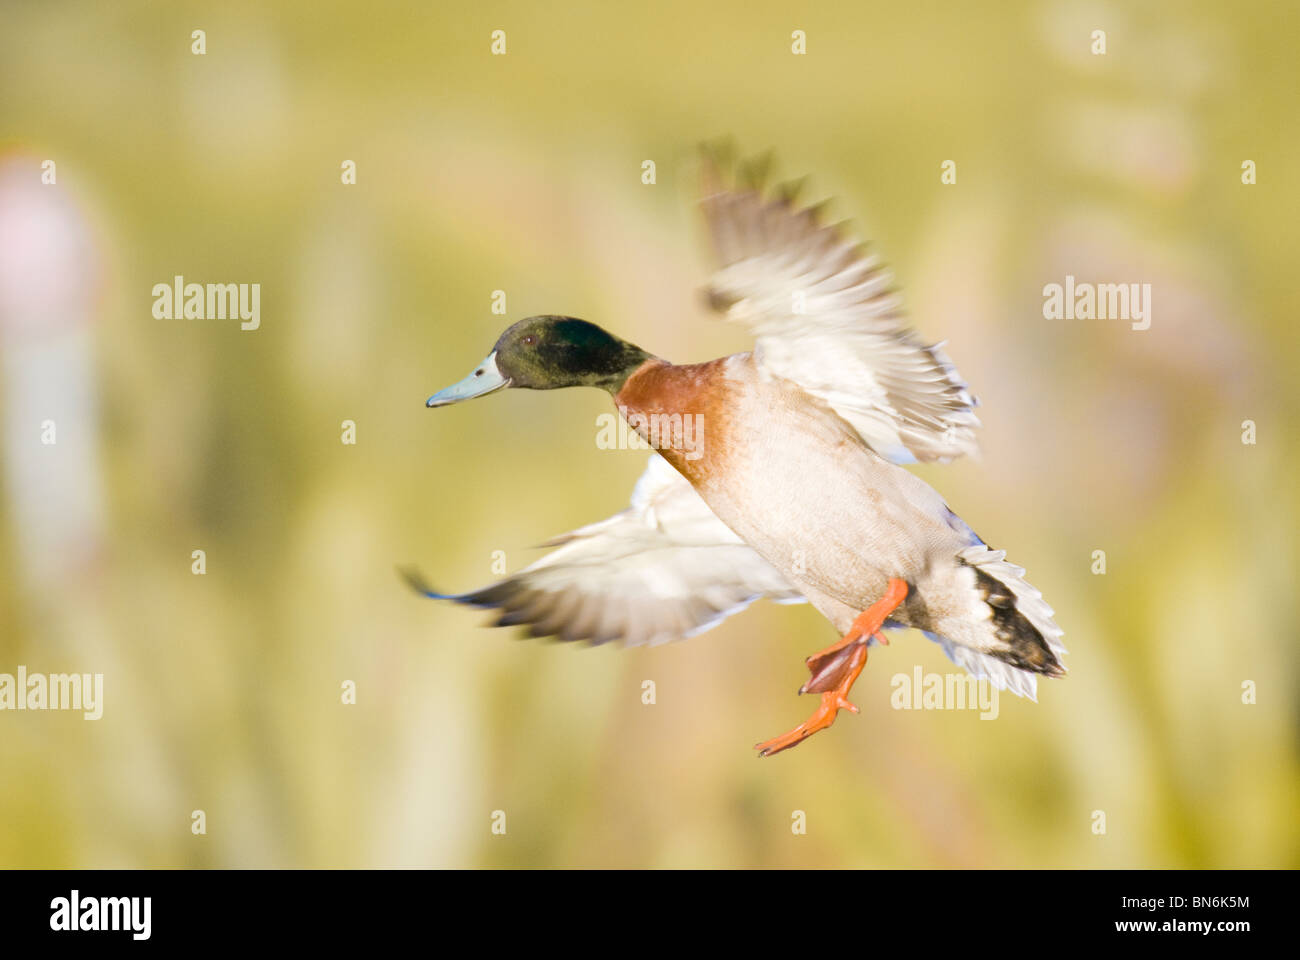 Male Mallard Duck  Anas platyrhynchos flying New Zealand - Stock Image